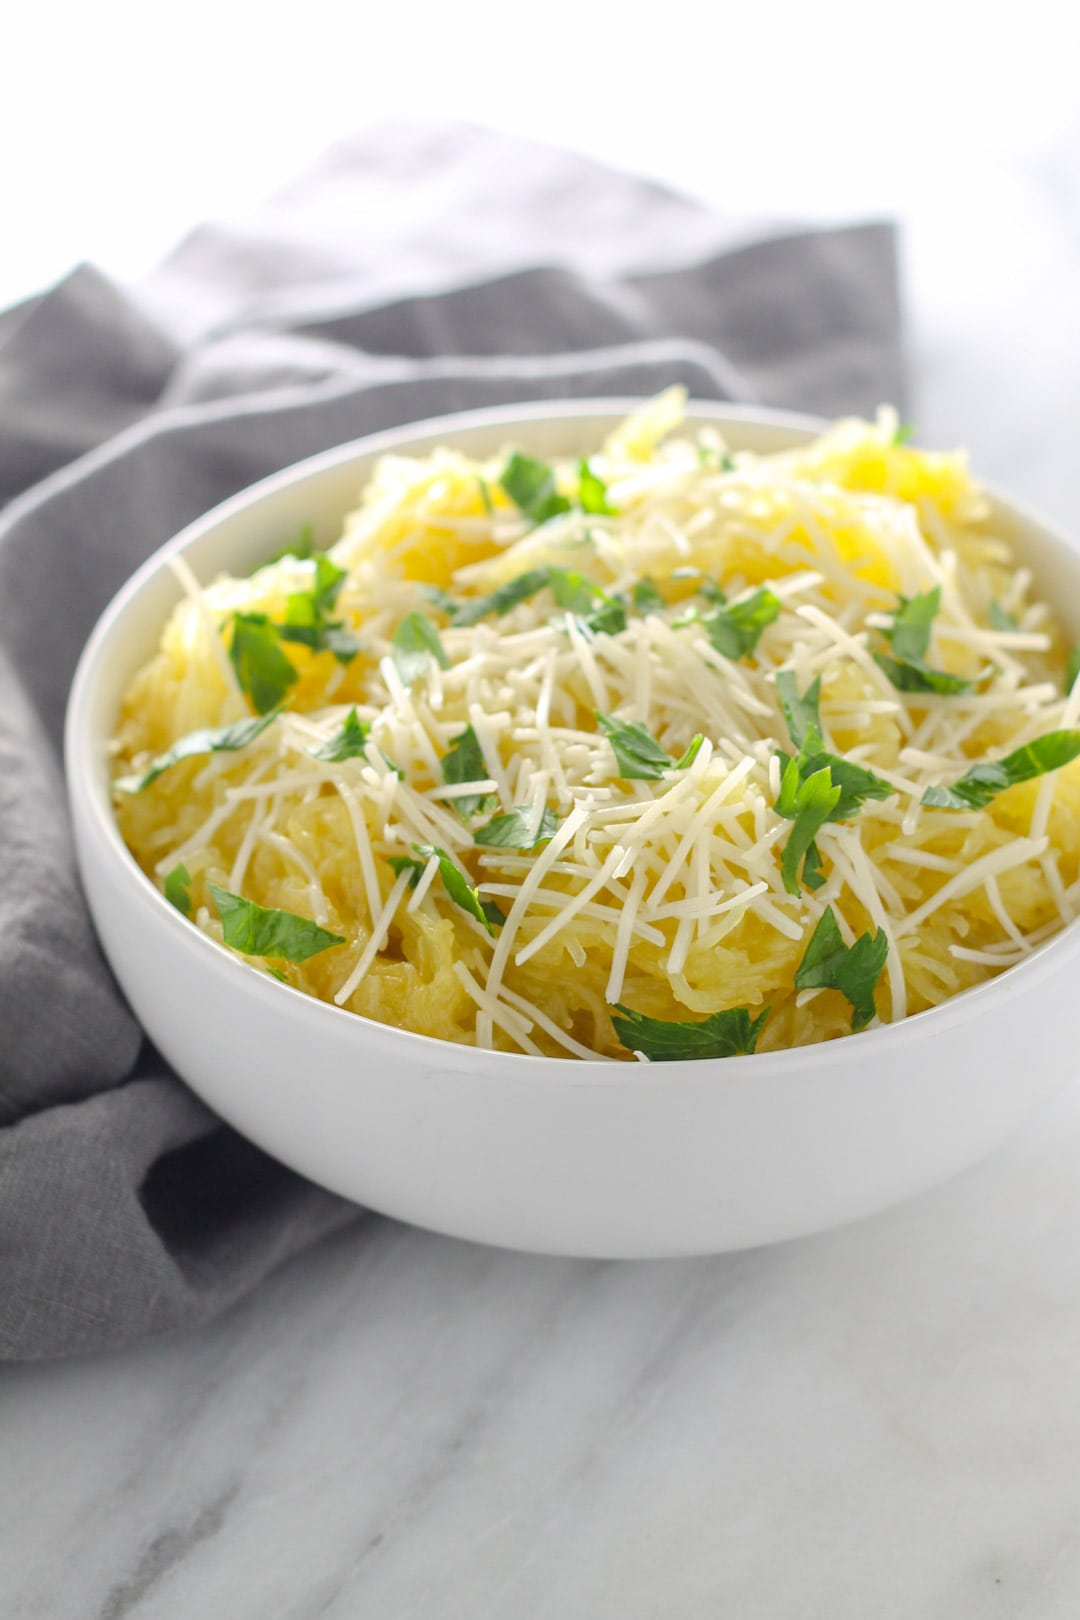 Low FODMAP Spaghetti Squash with Pecorino